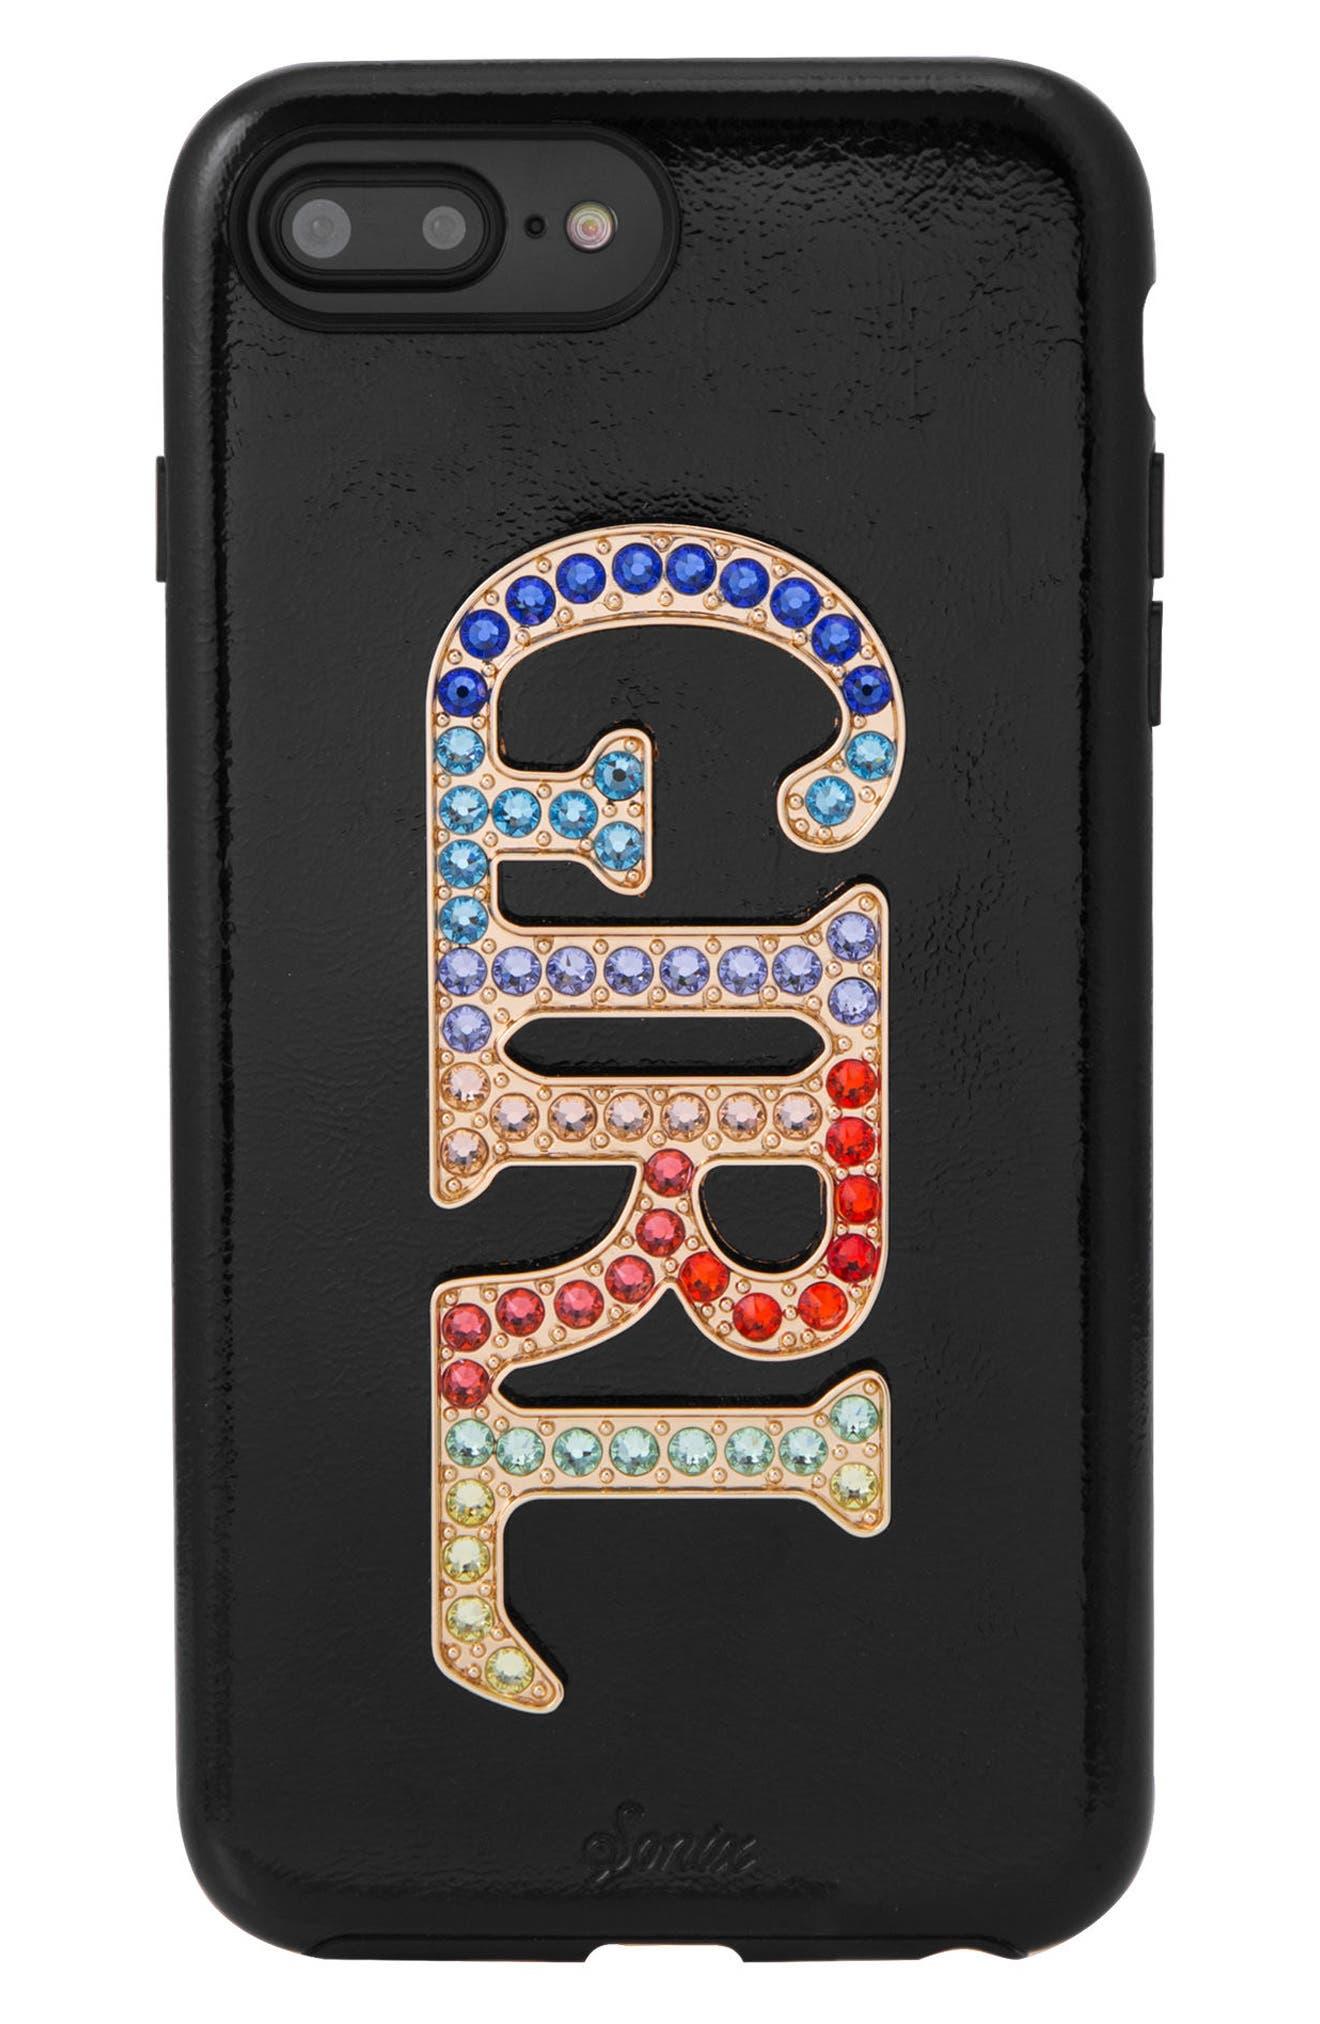 Girl Crystal Embellished iPhone 6/6s/7/8 Plus Case,                         Main,                         color, Black/ Multi